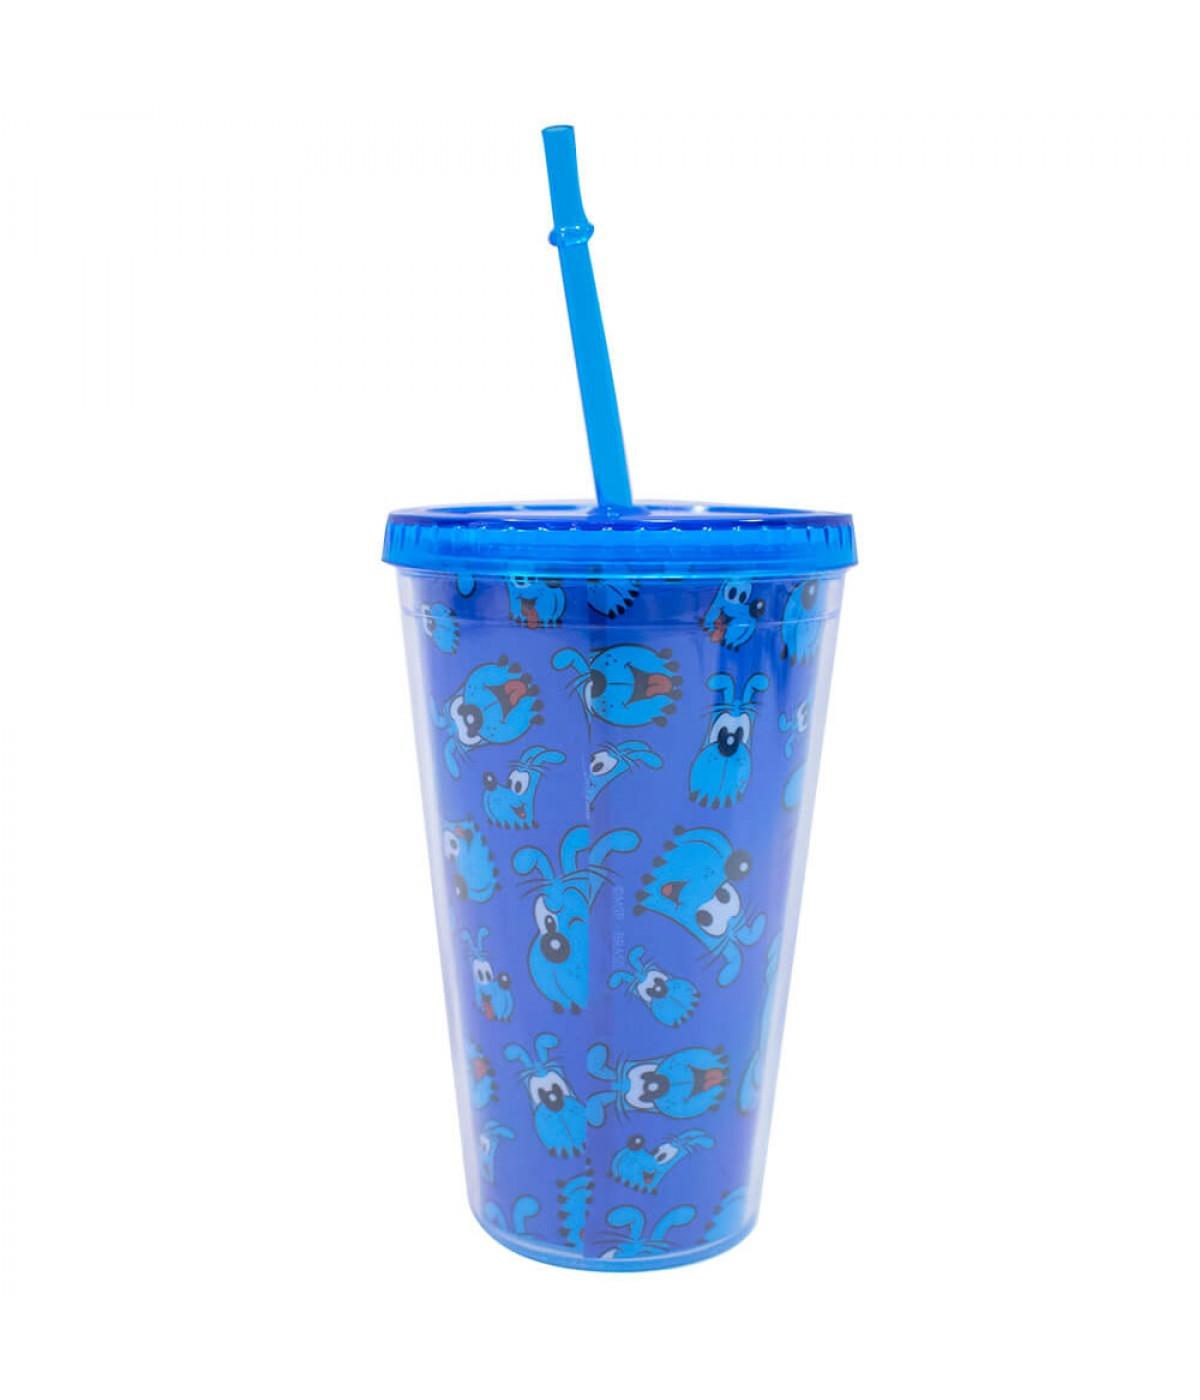 Copo Azul Canudo Bidu 450ml - Turma da Mônica